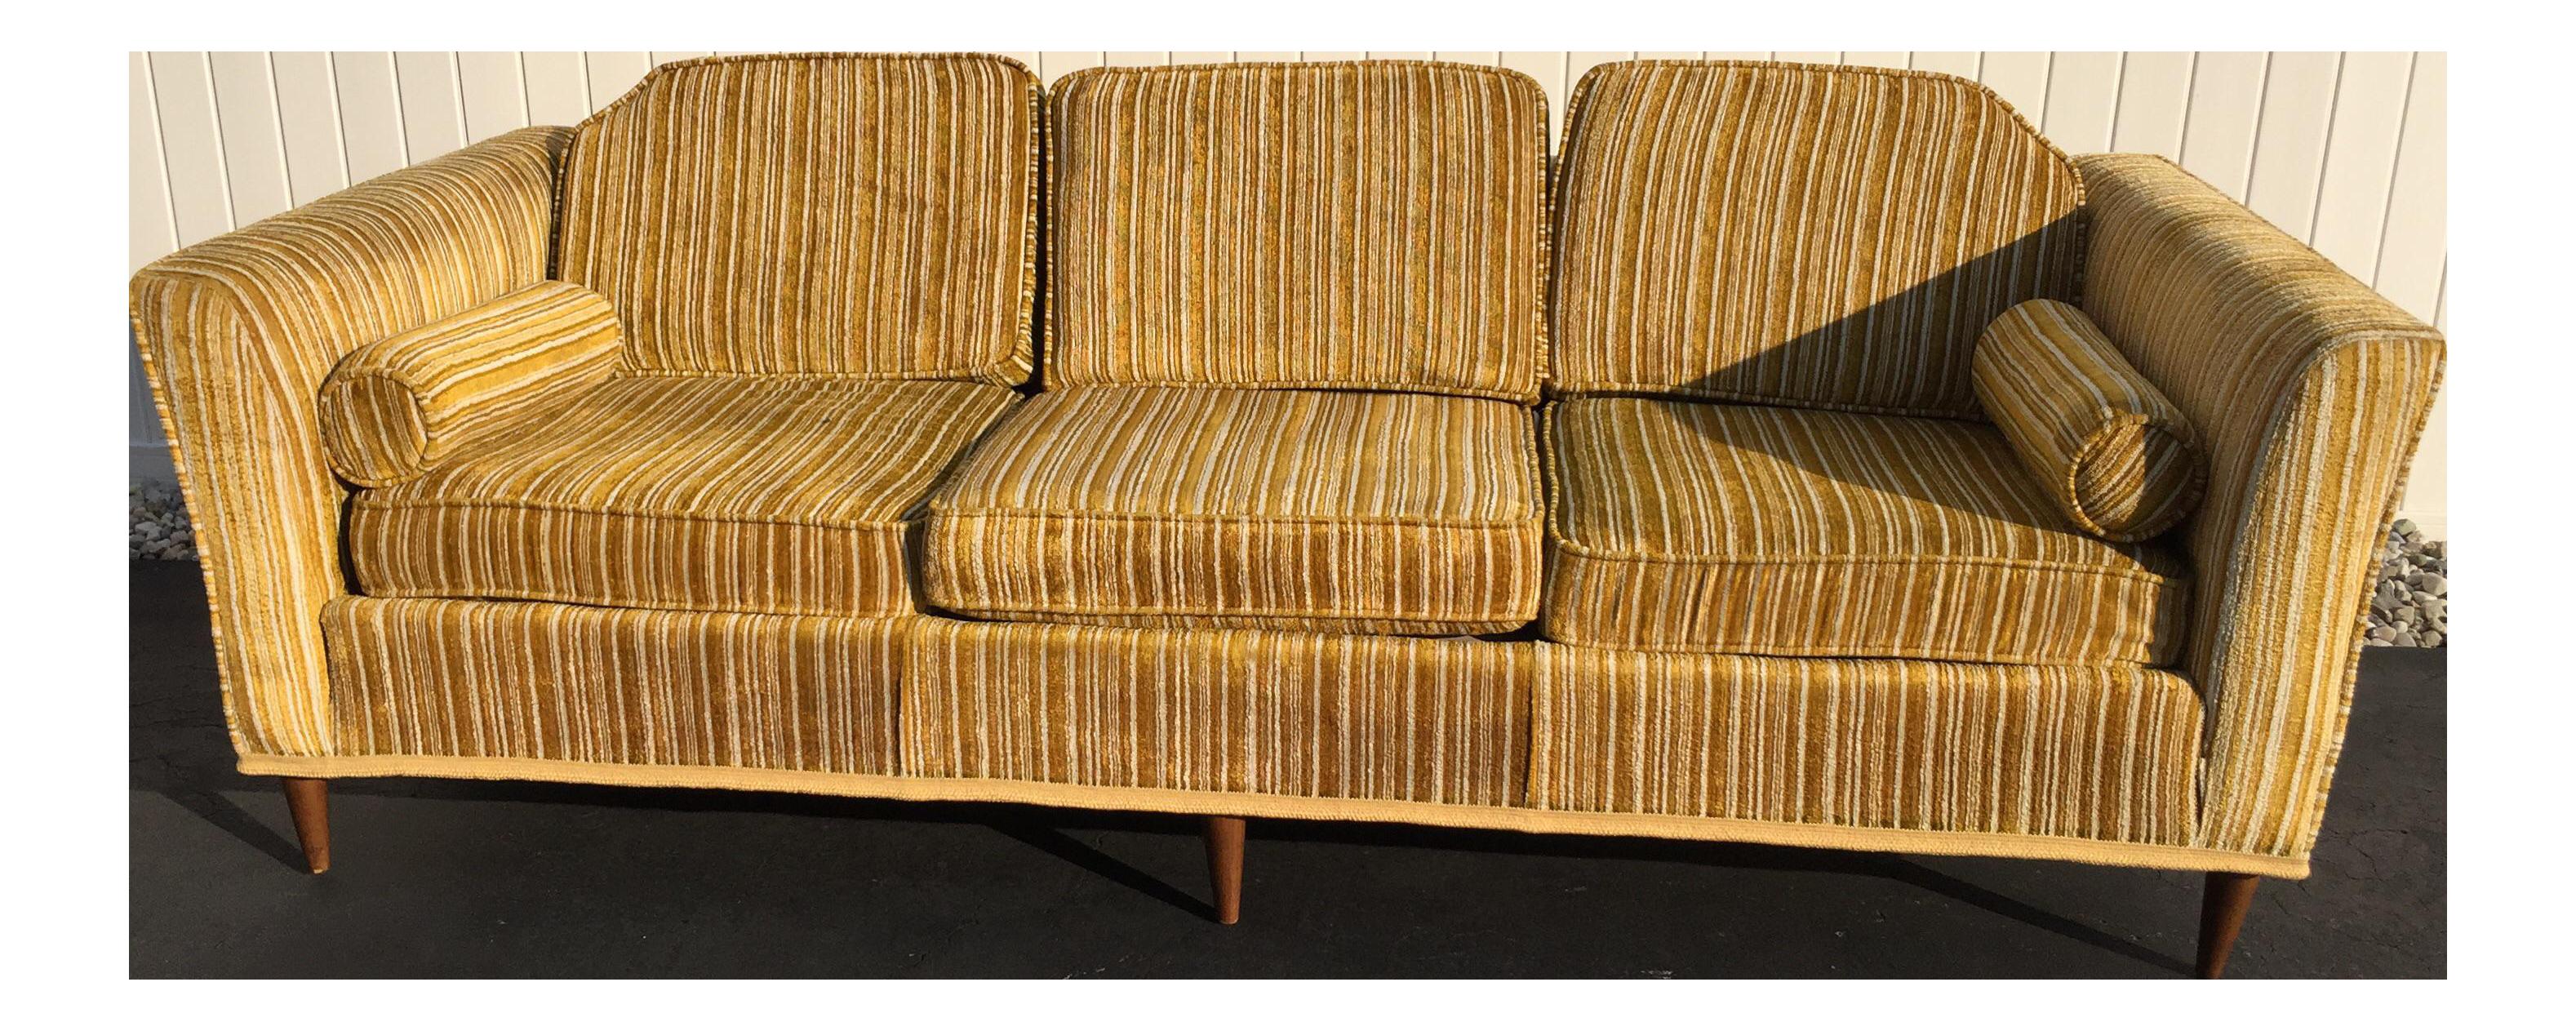 Kroehler Royale Mid Century Gold Striped Sofa